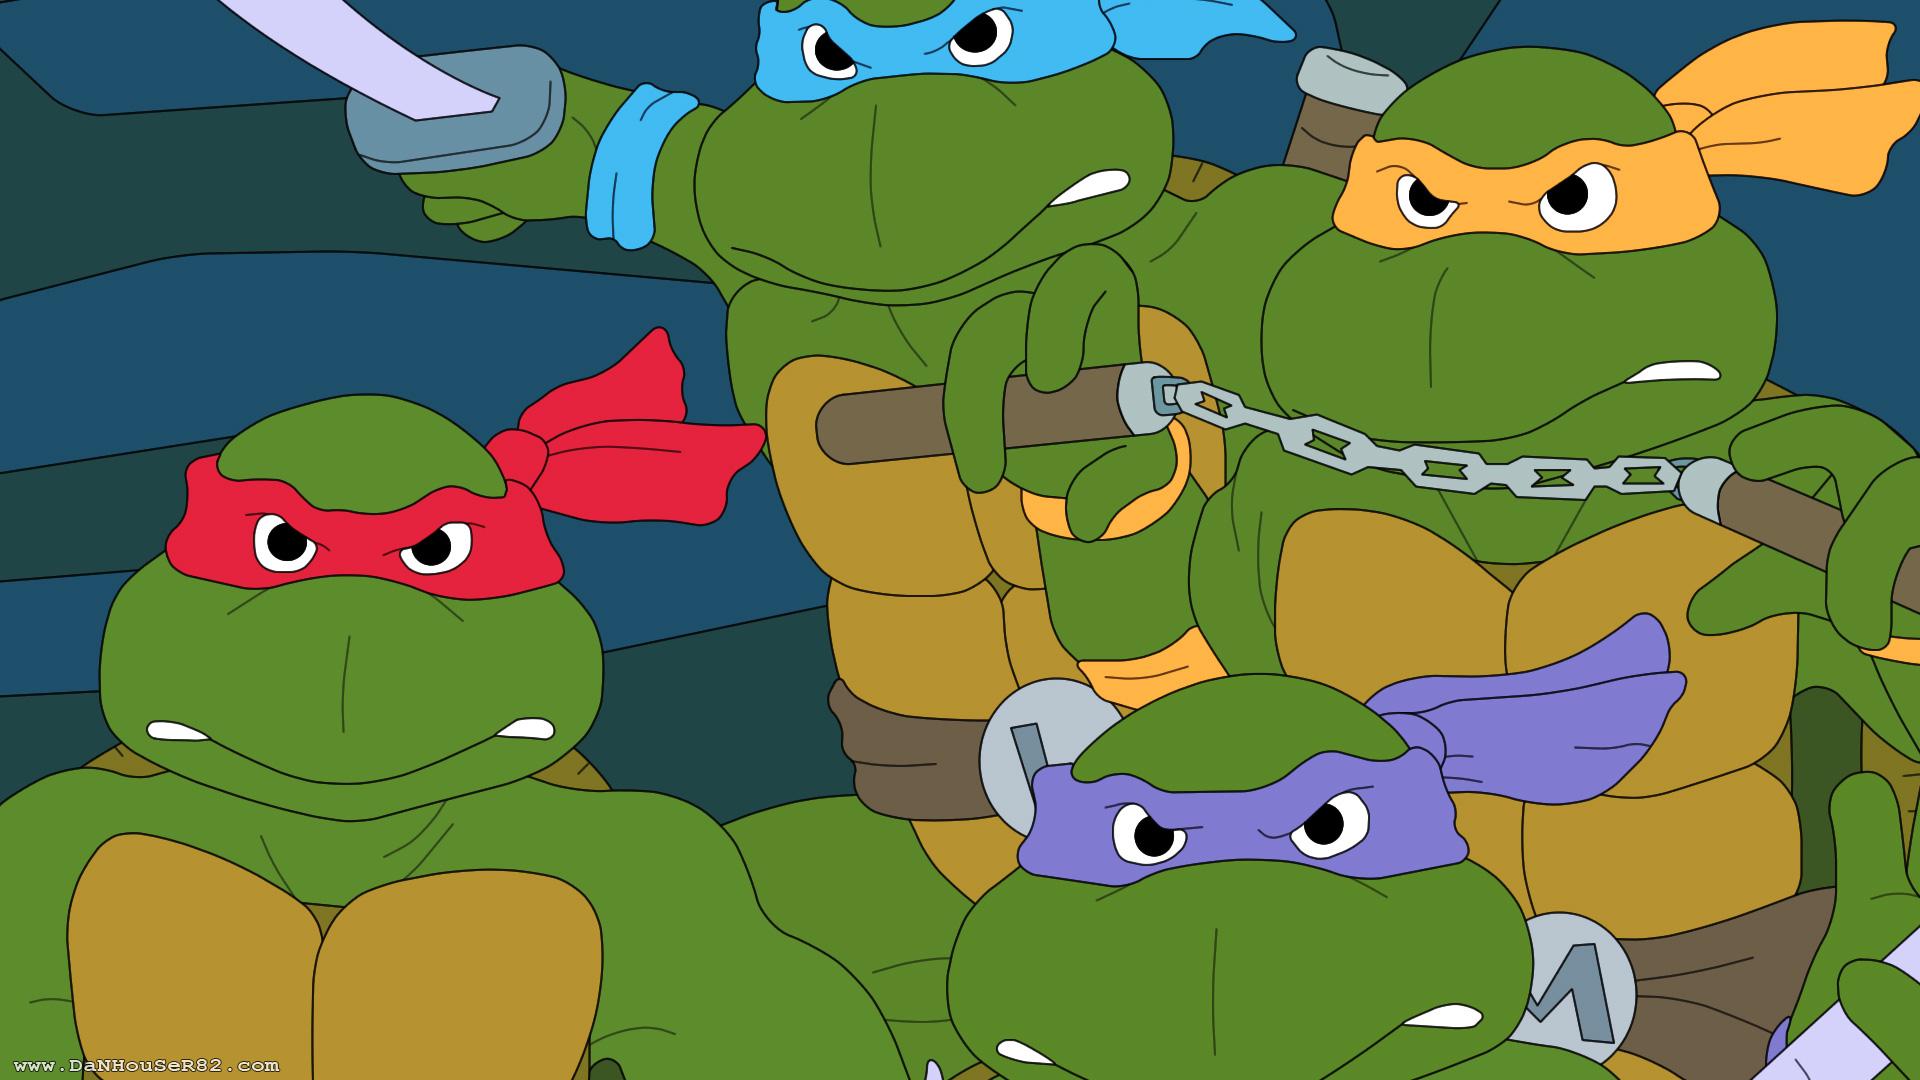 Teenage mutant ninja turtles comic wallpaper - photo#55